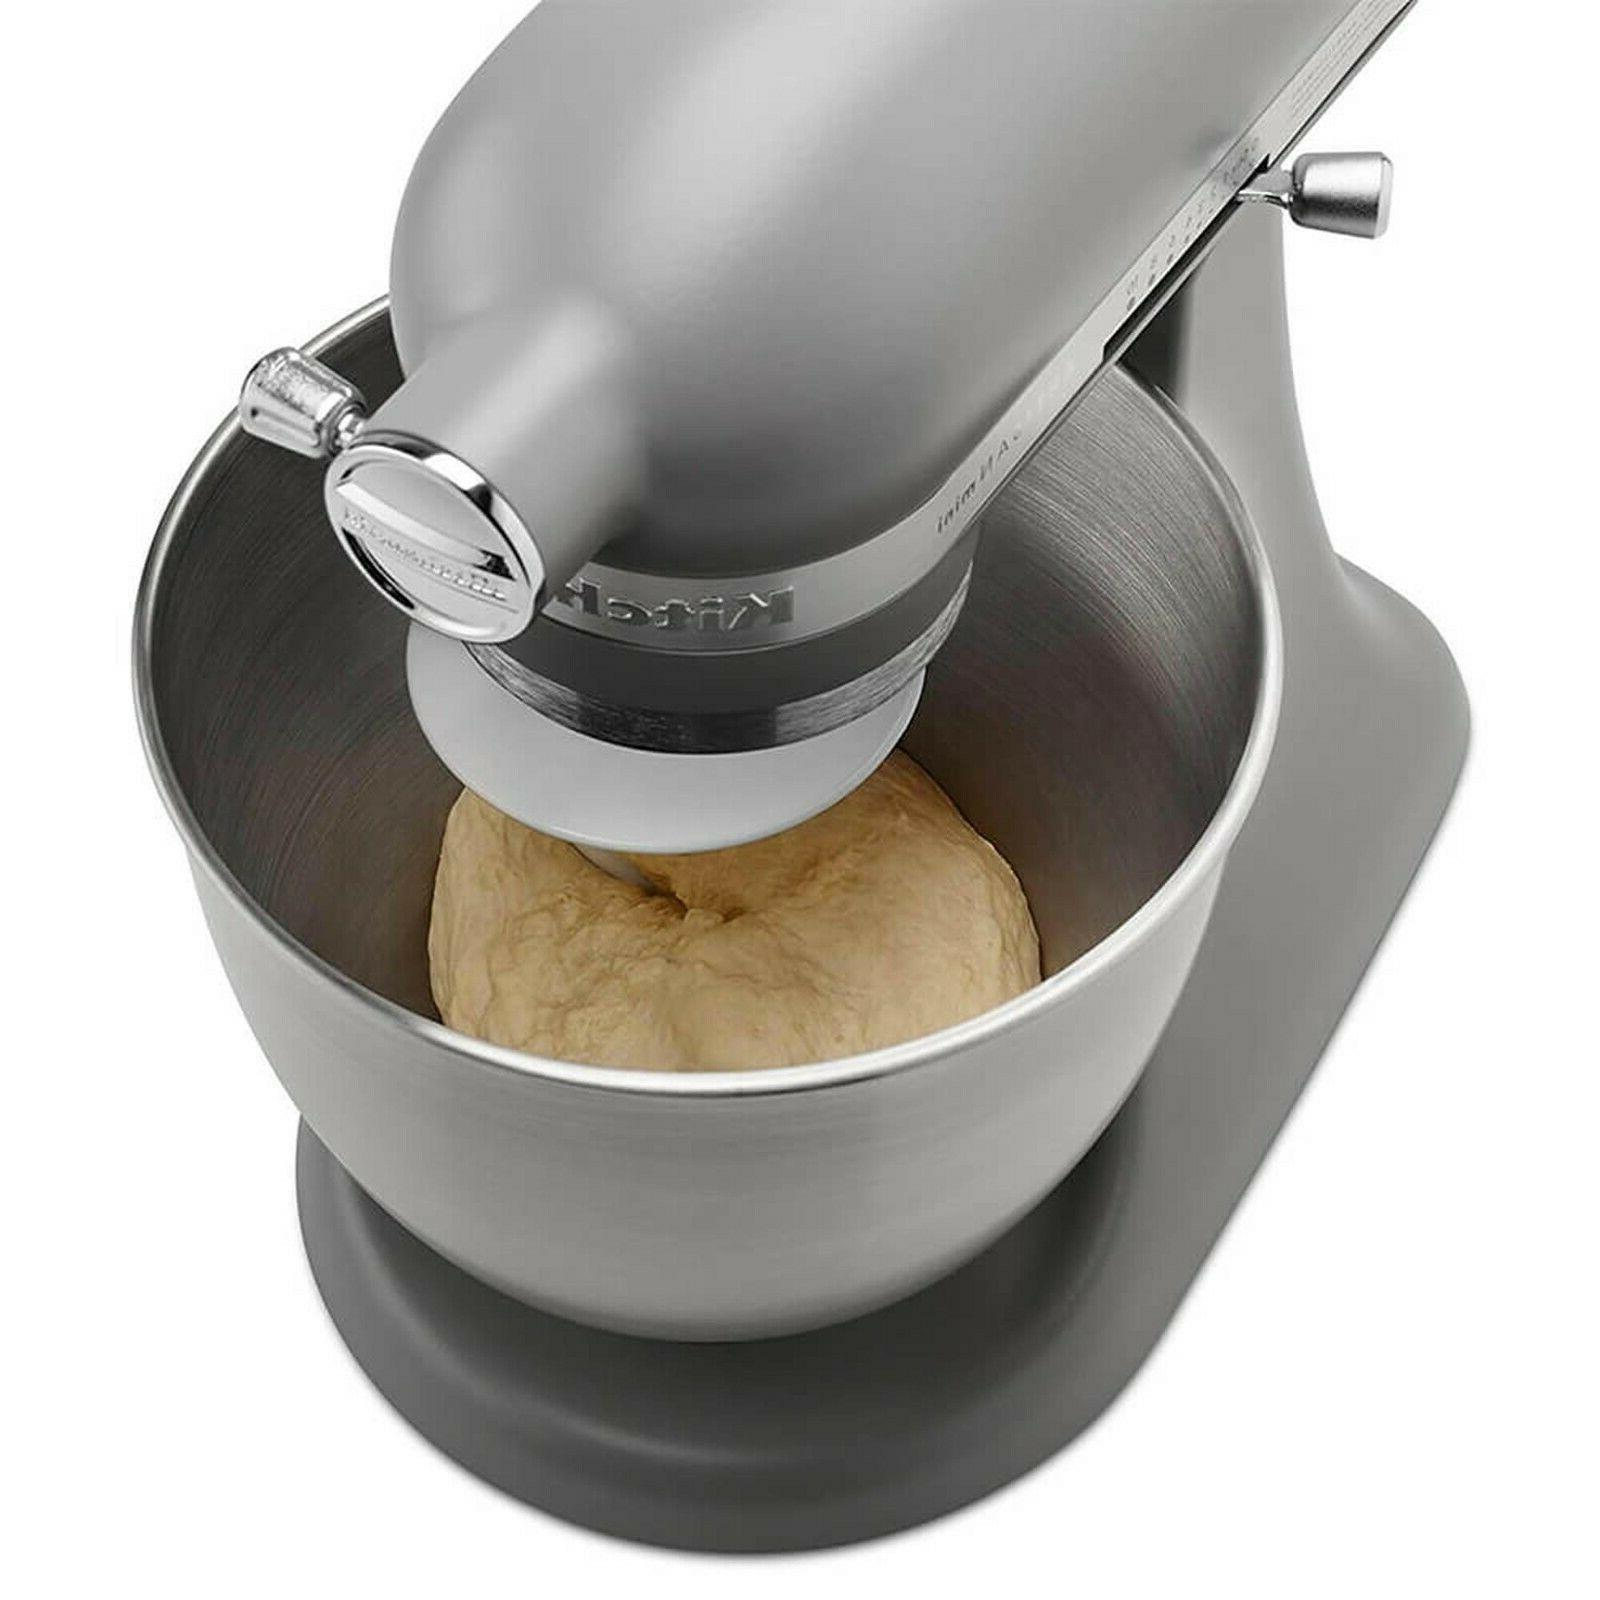 KitchenAid Tilt Stand Mixer Matte